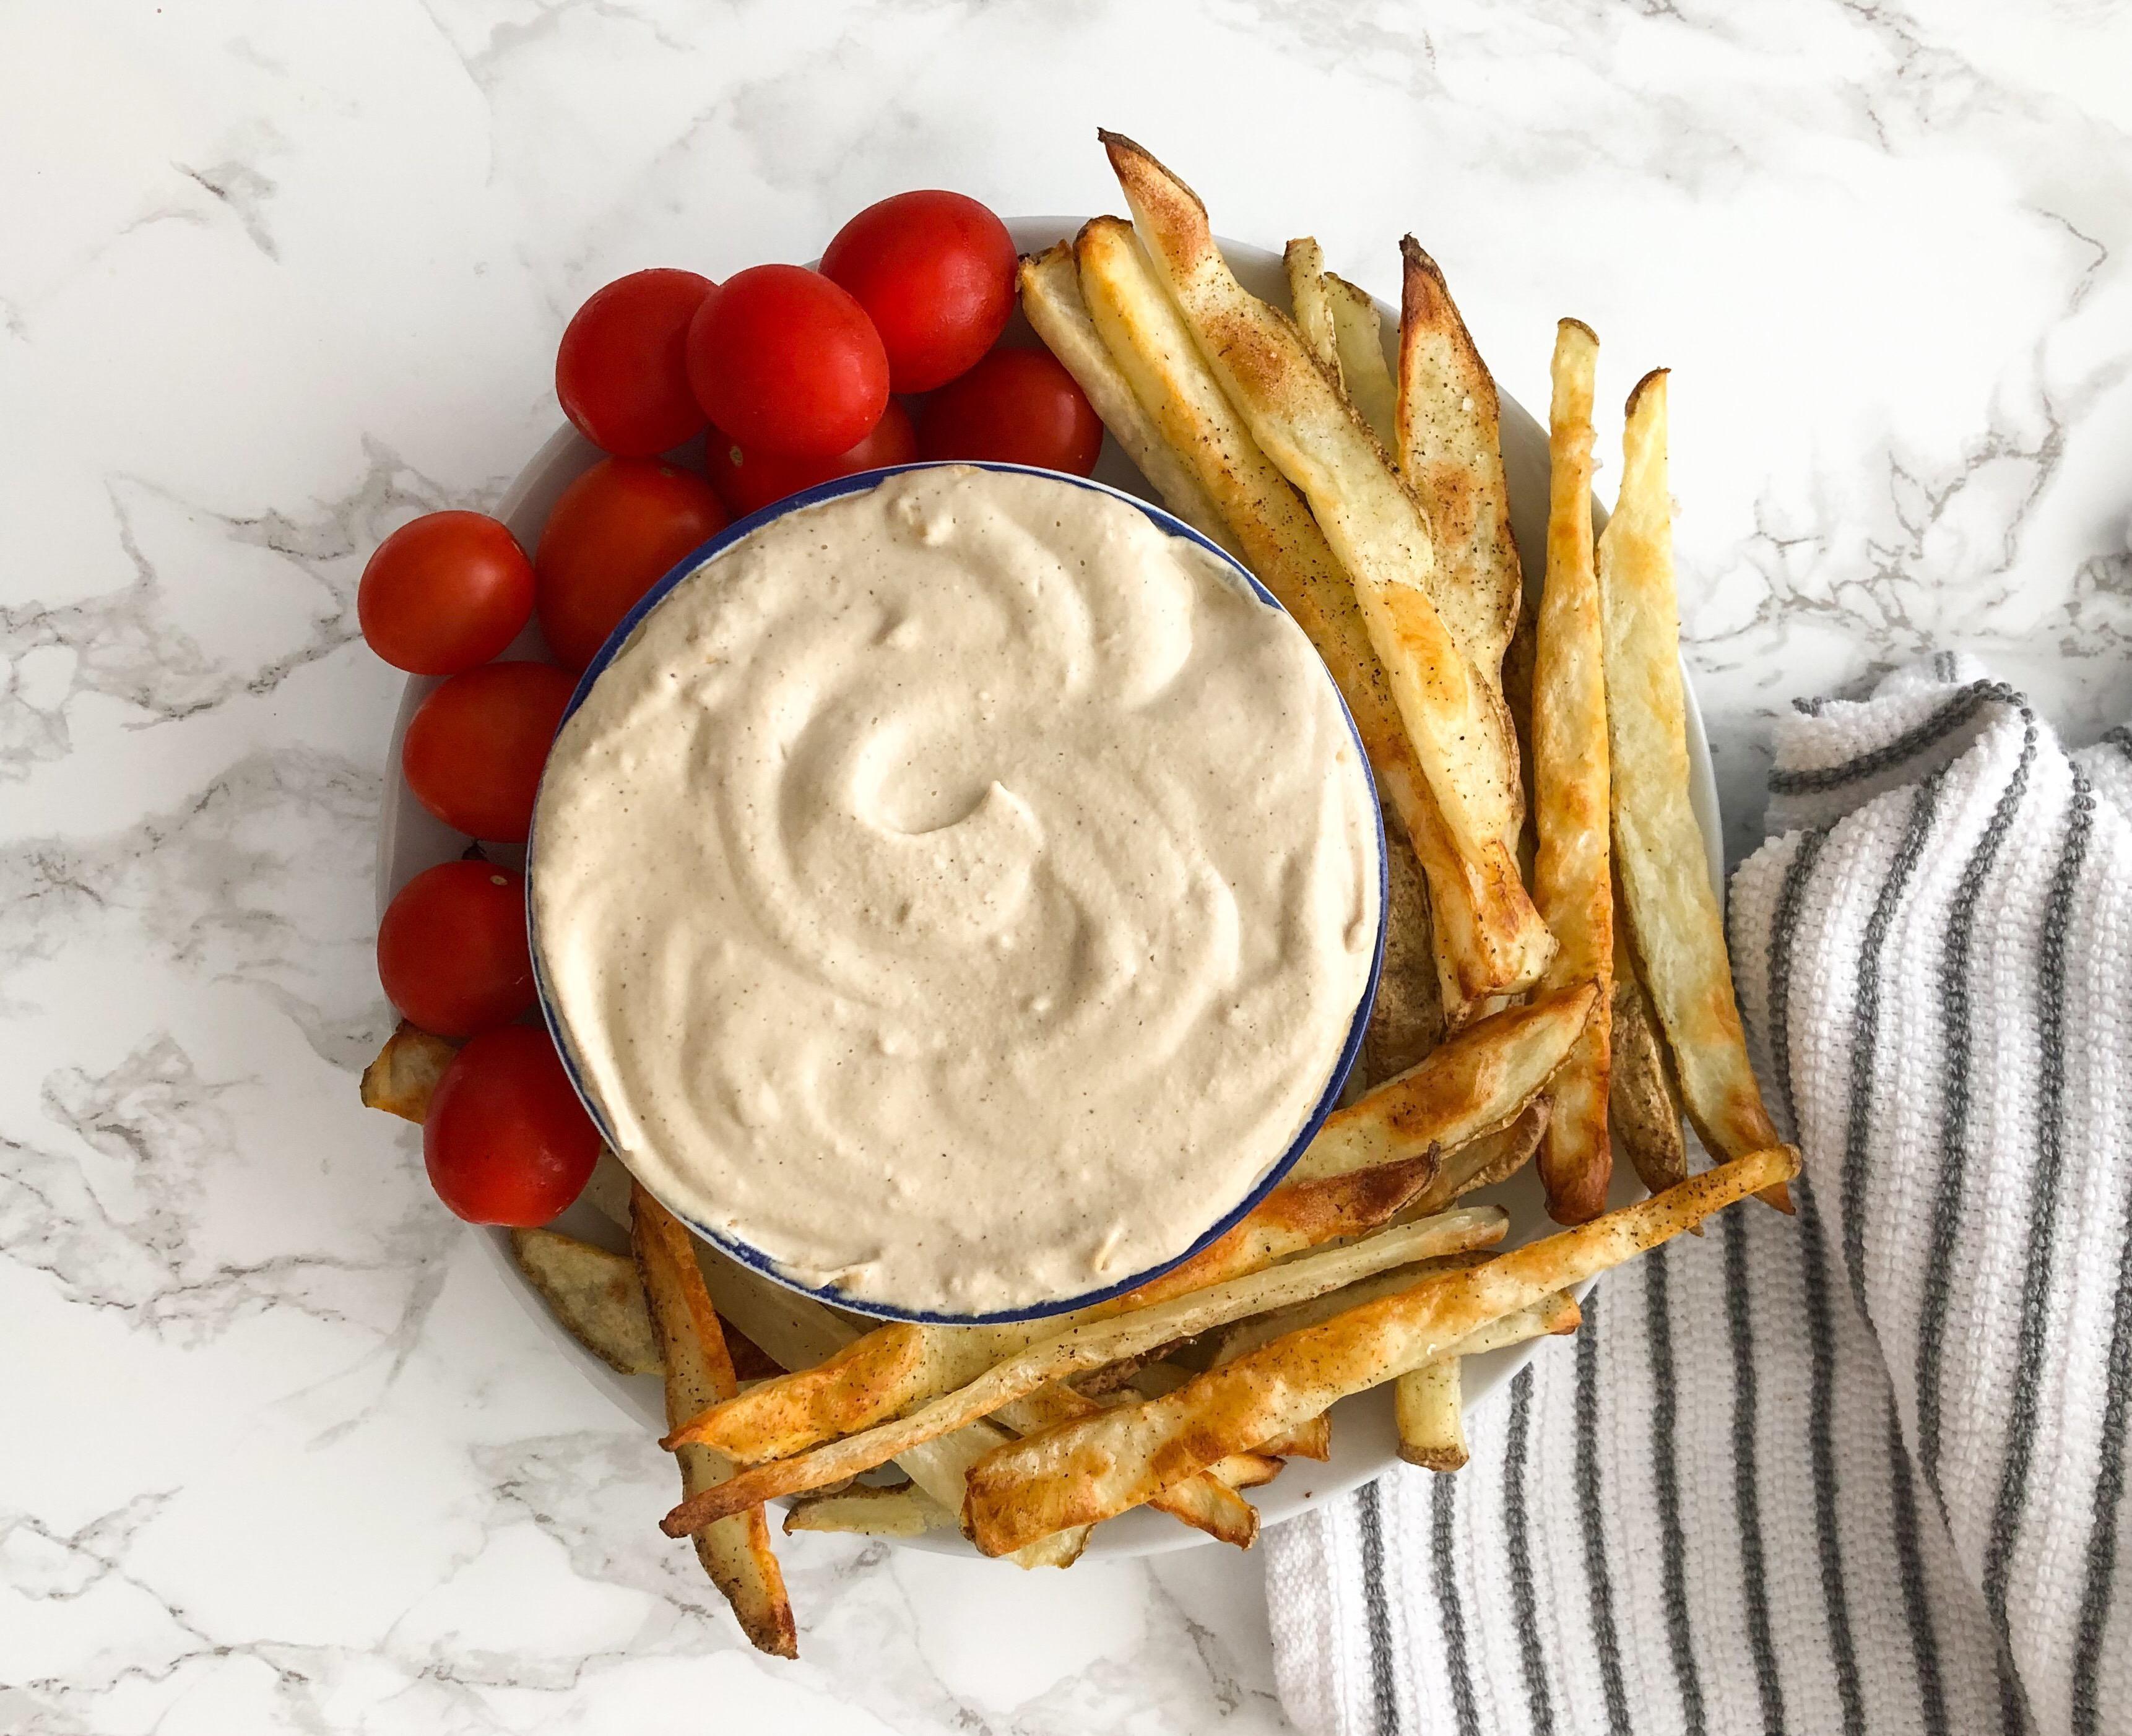 Easy glutenfree appetizer! Creamy Chipotle Cashew Dip